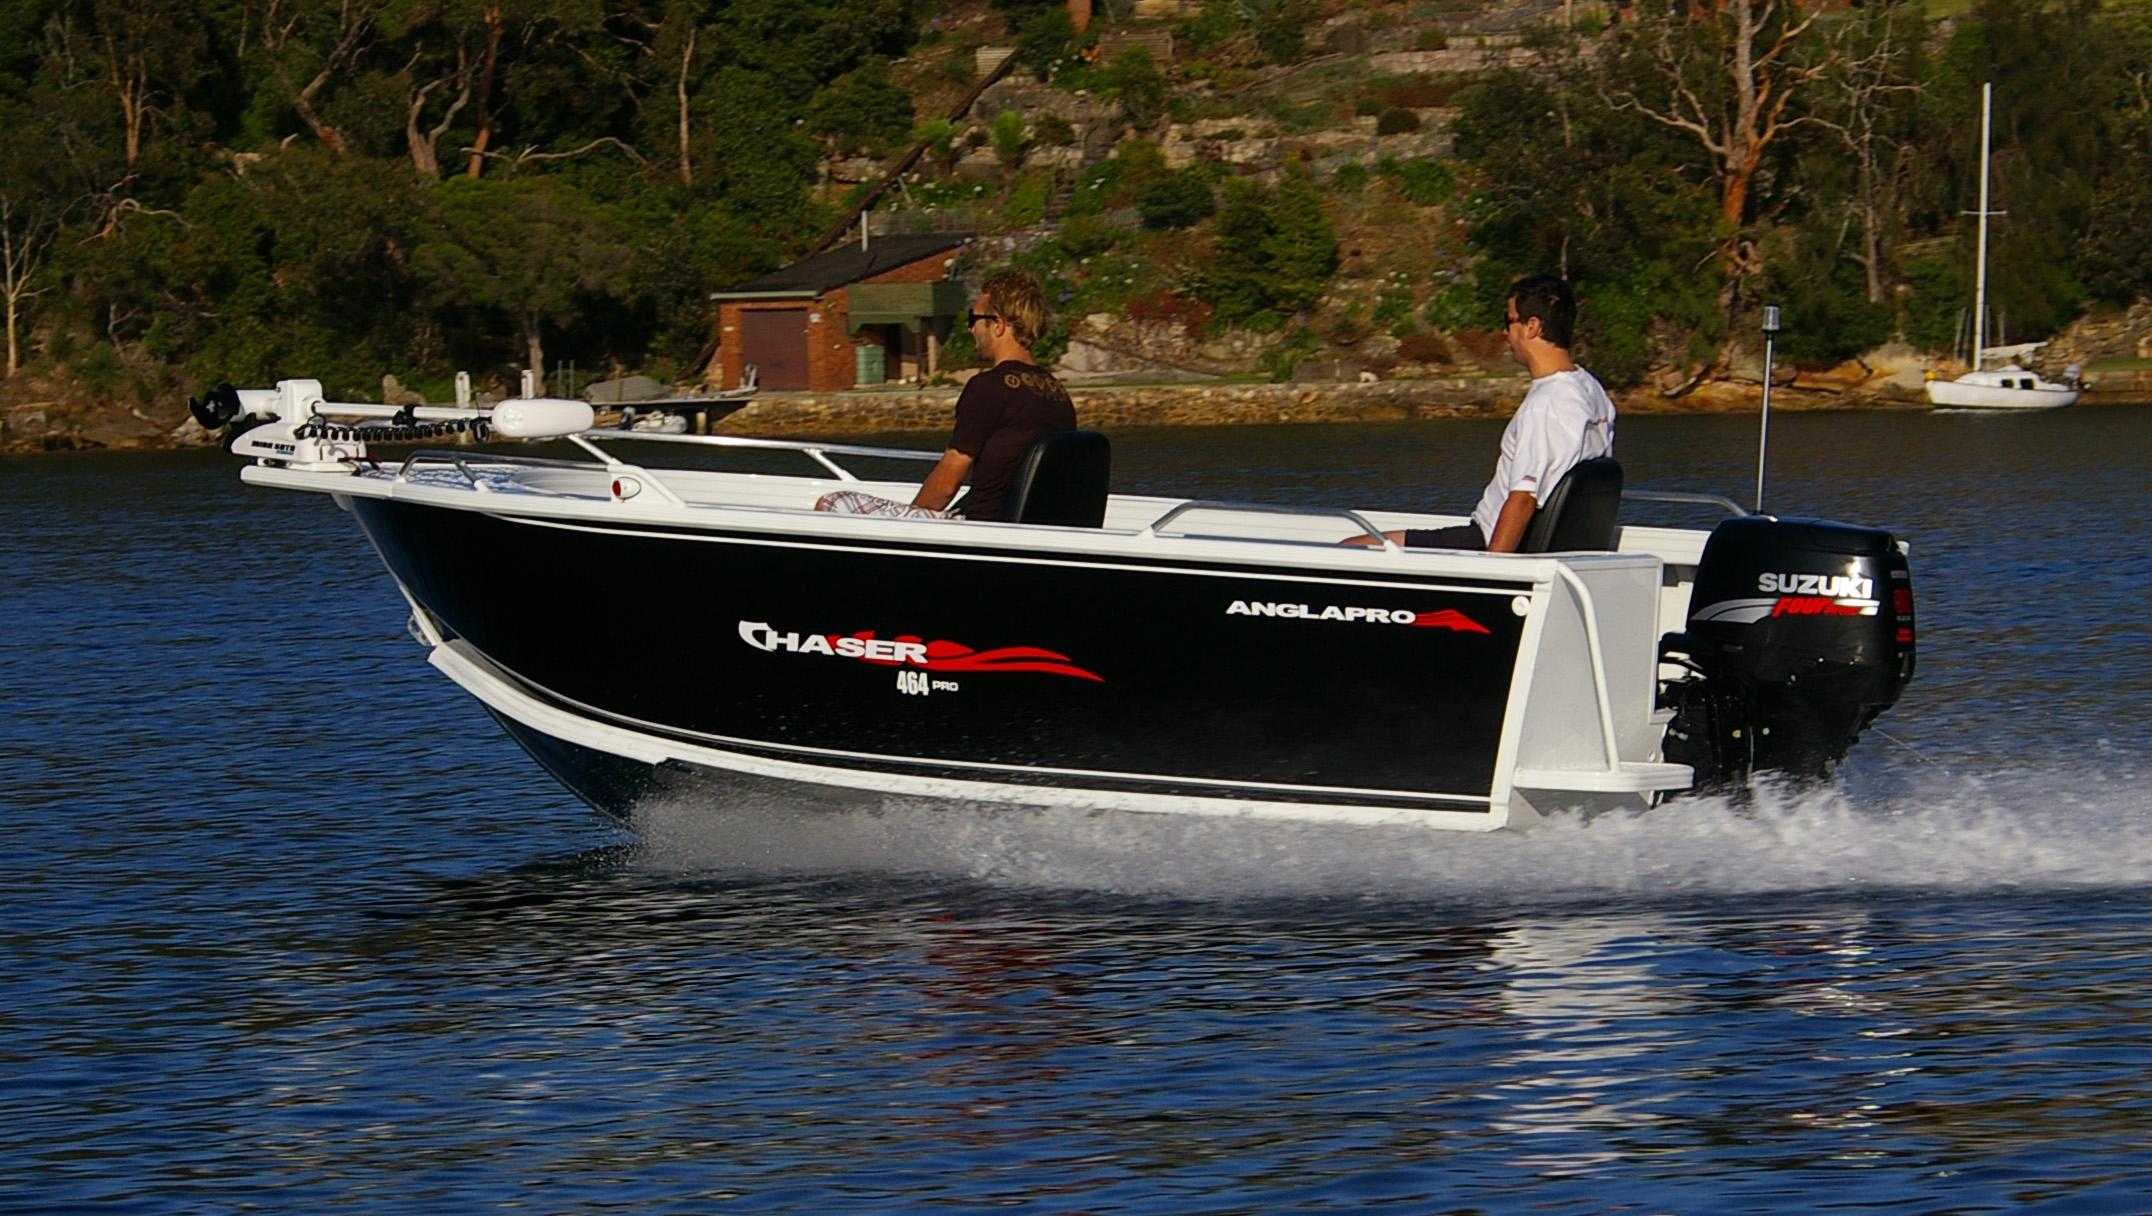 Chaser 464 PRO 050